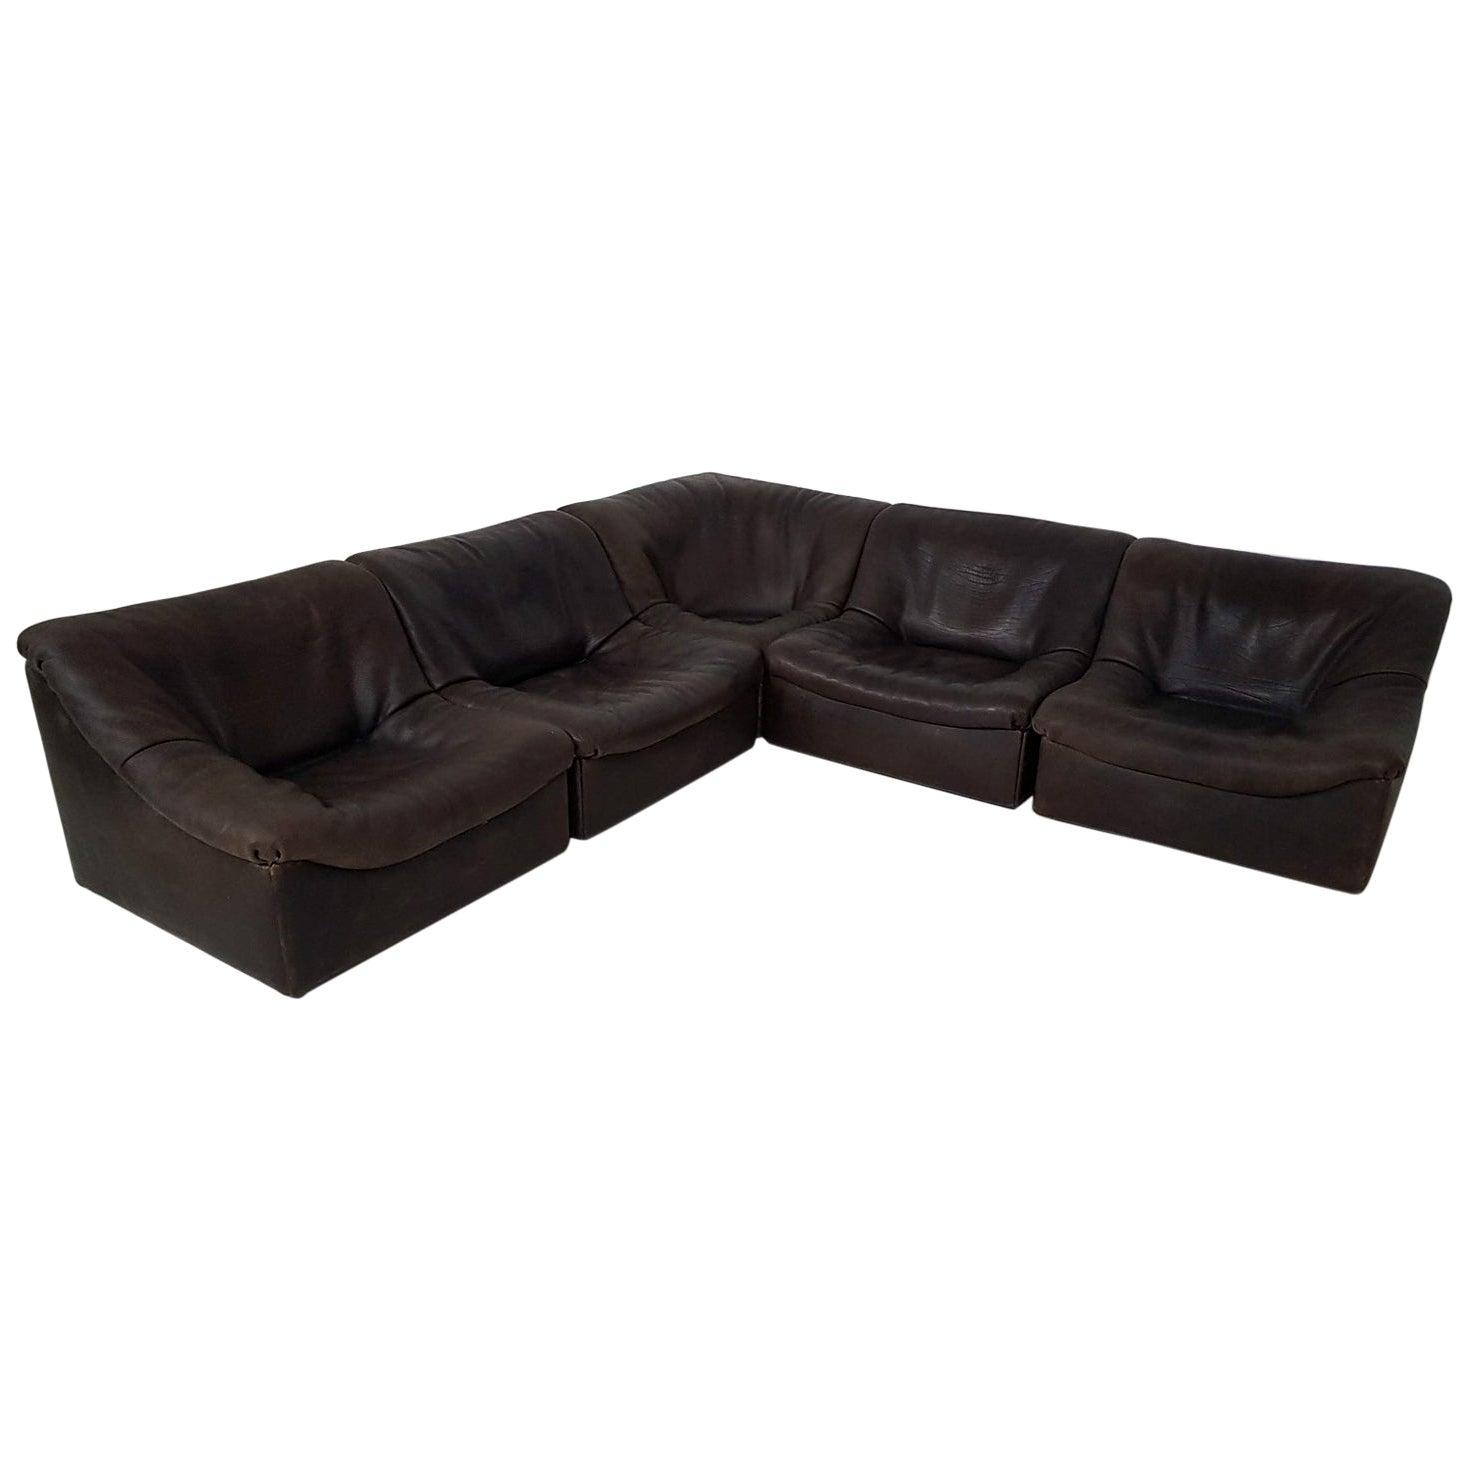 "Dark Brown Neck Leather Modular ""DS46"" Sofa by De Sede, Switzerland, 1970s"